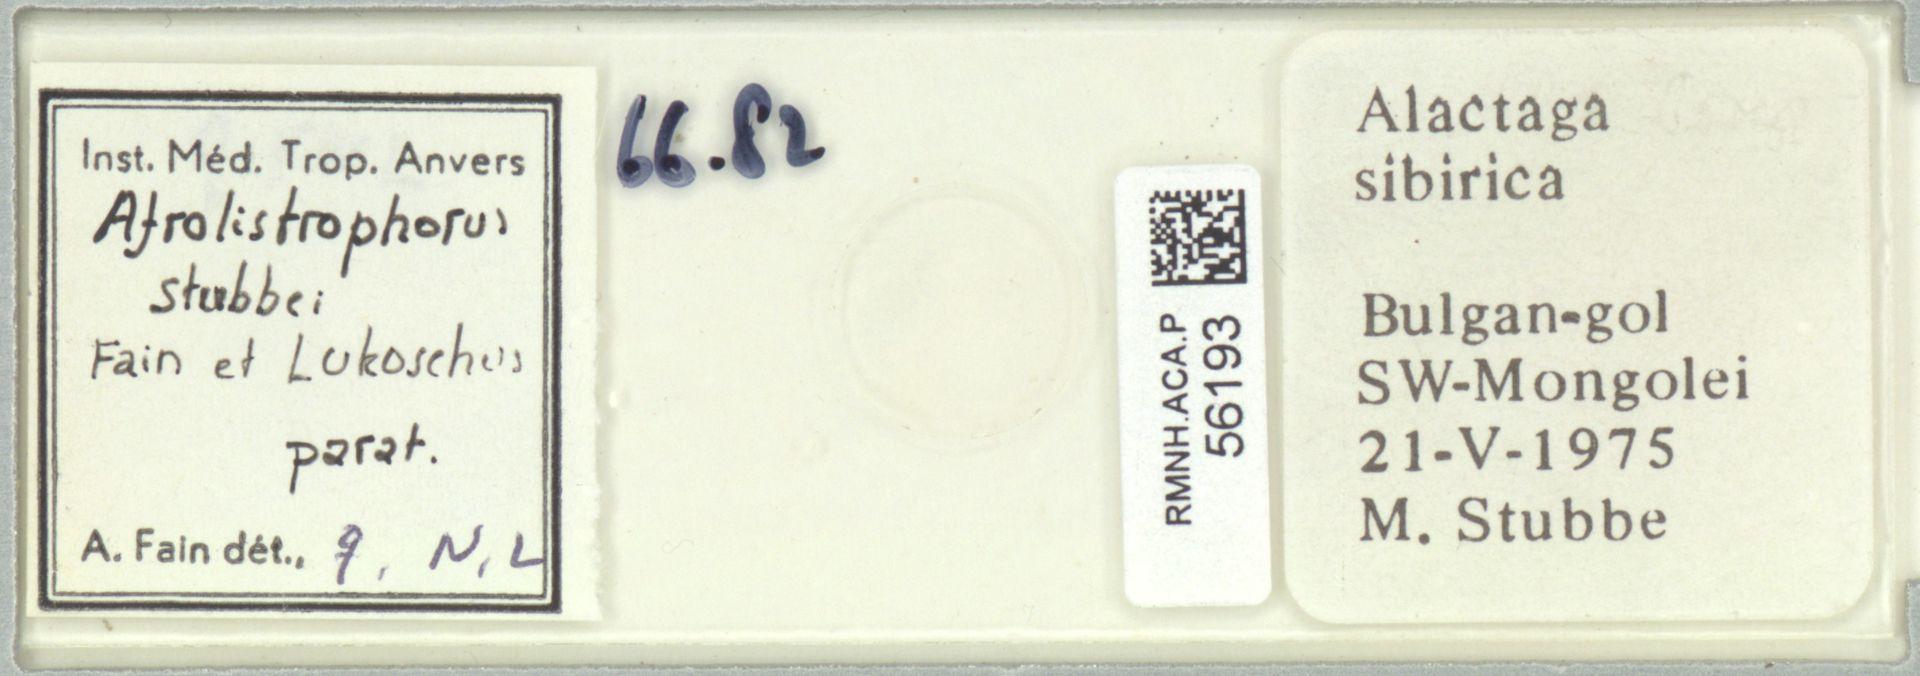 RMNH.ACA.P.56193 | Afrolistrophorus stubbei Fain et Lukoschus